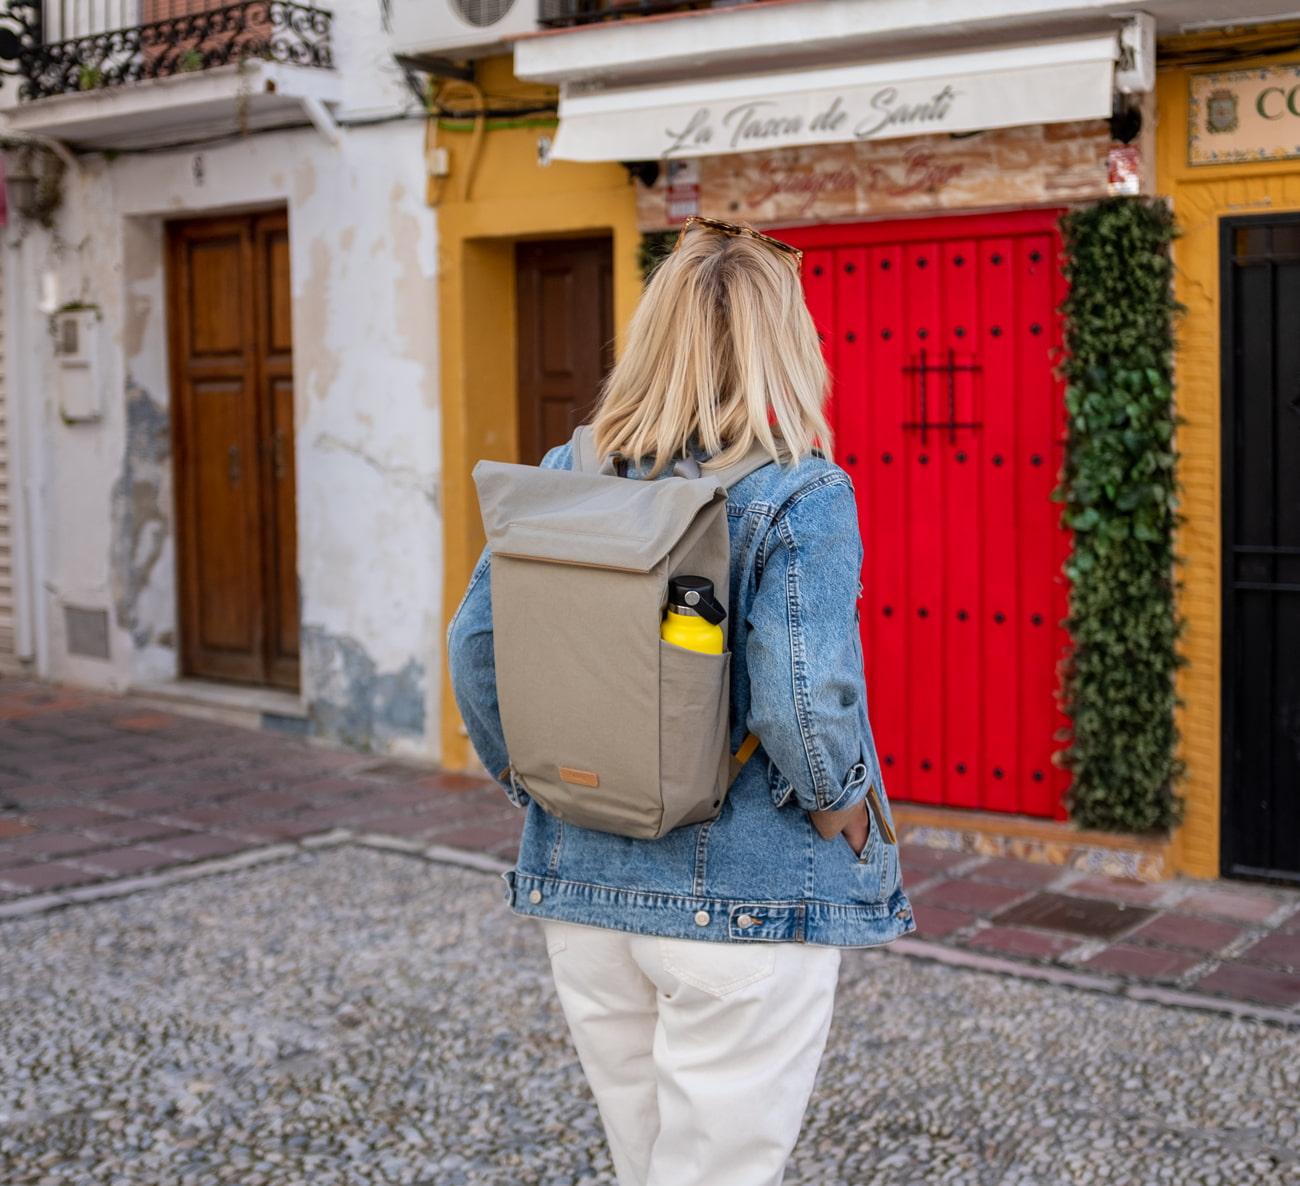 Best Backpack in 2021 for Women